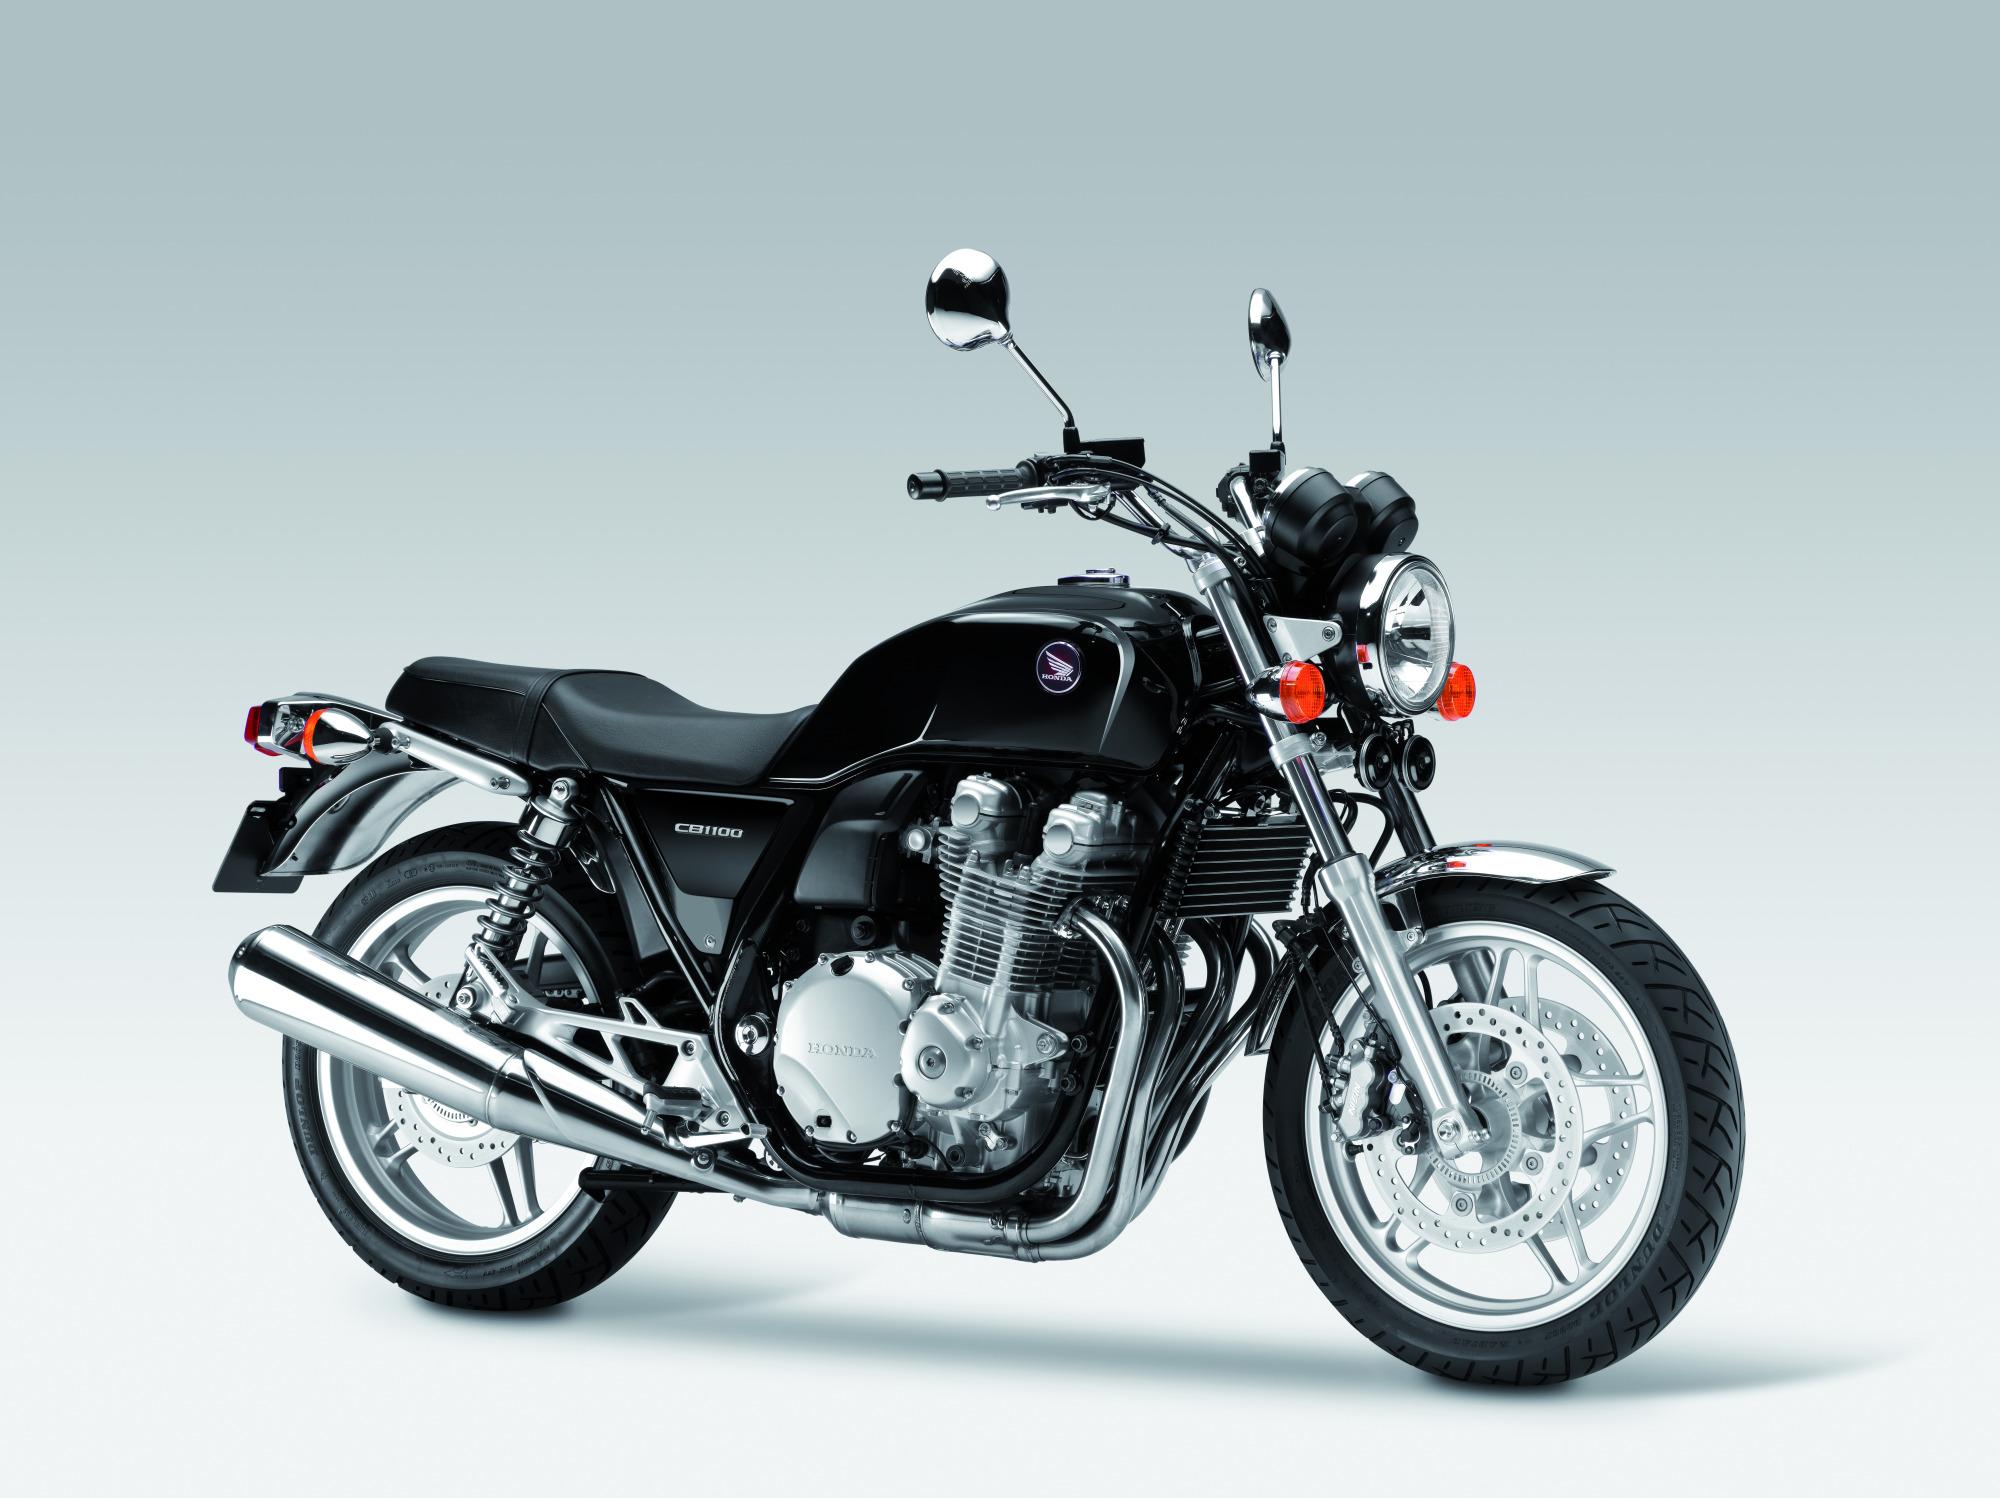 Honda CB 1100 RS - Roadster Honda CB1100RS - Moto